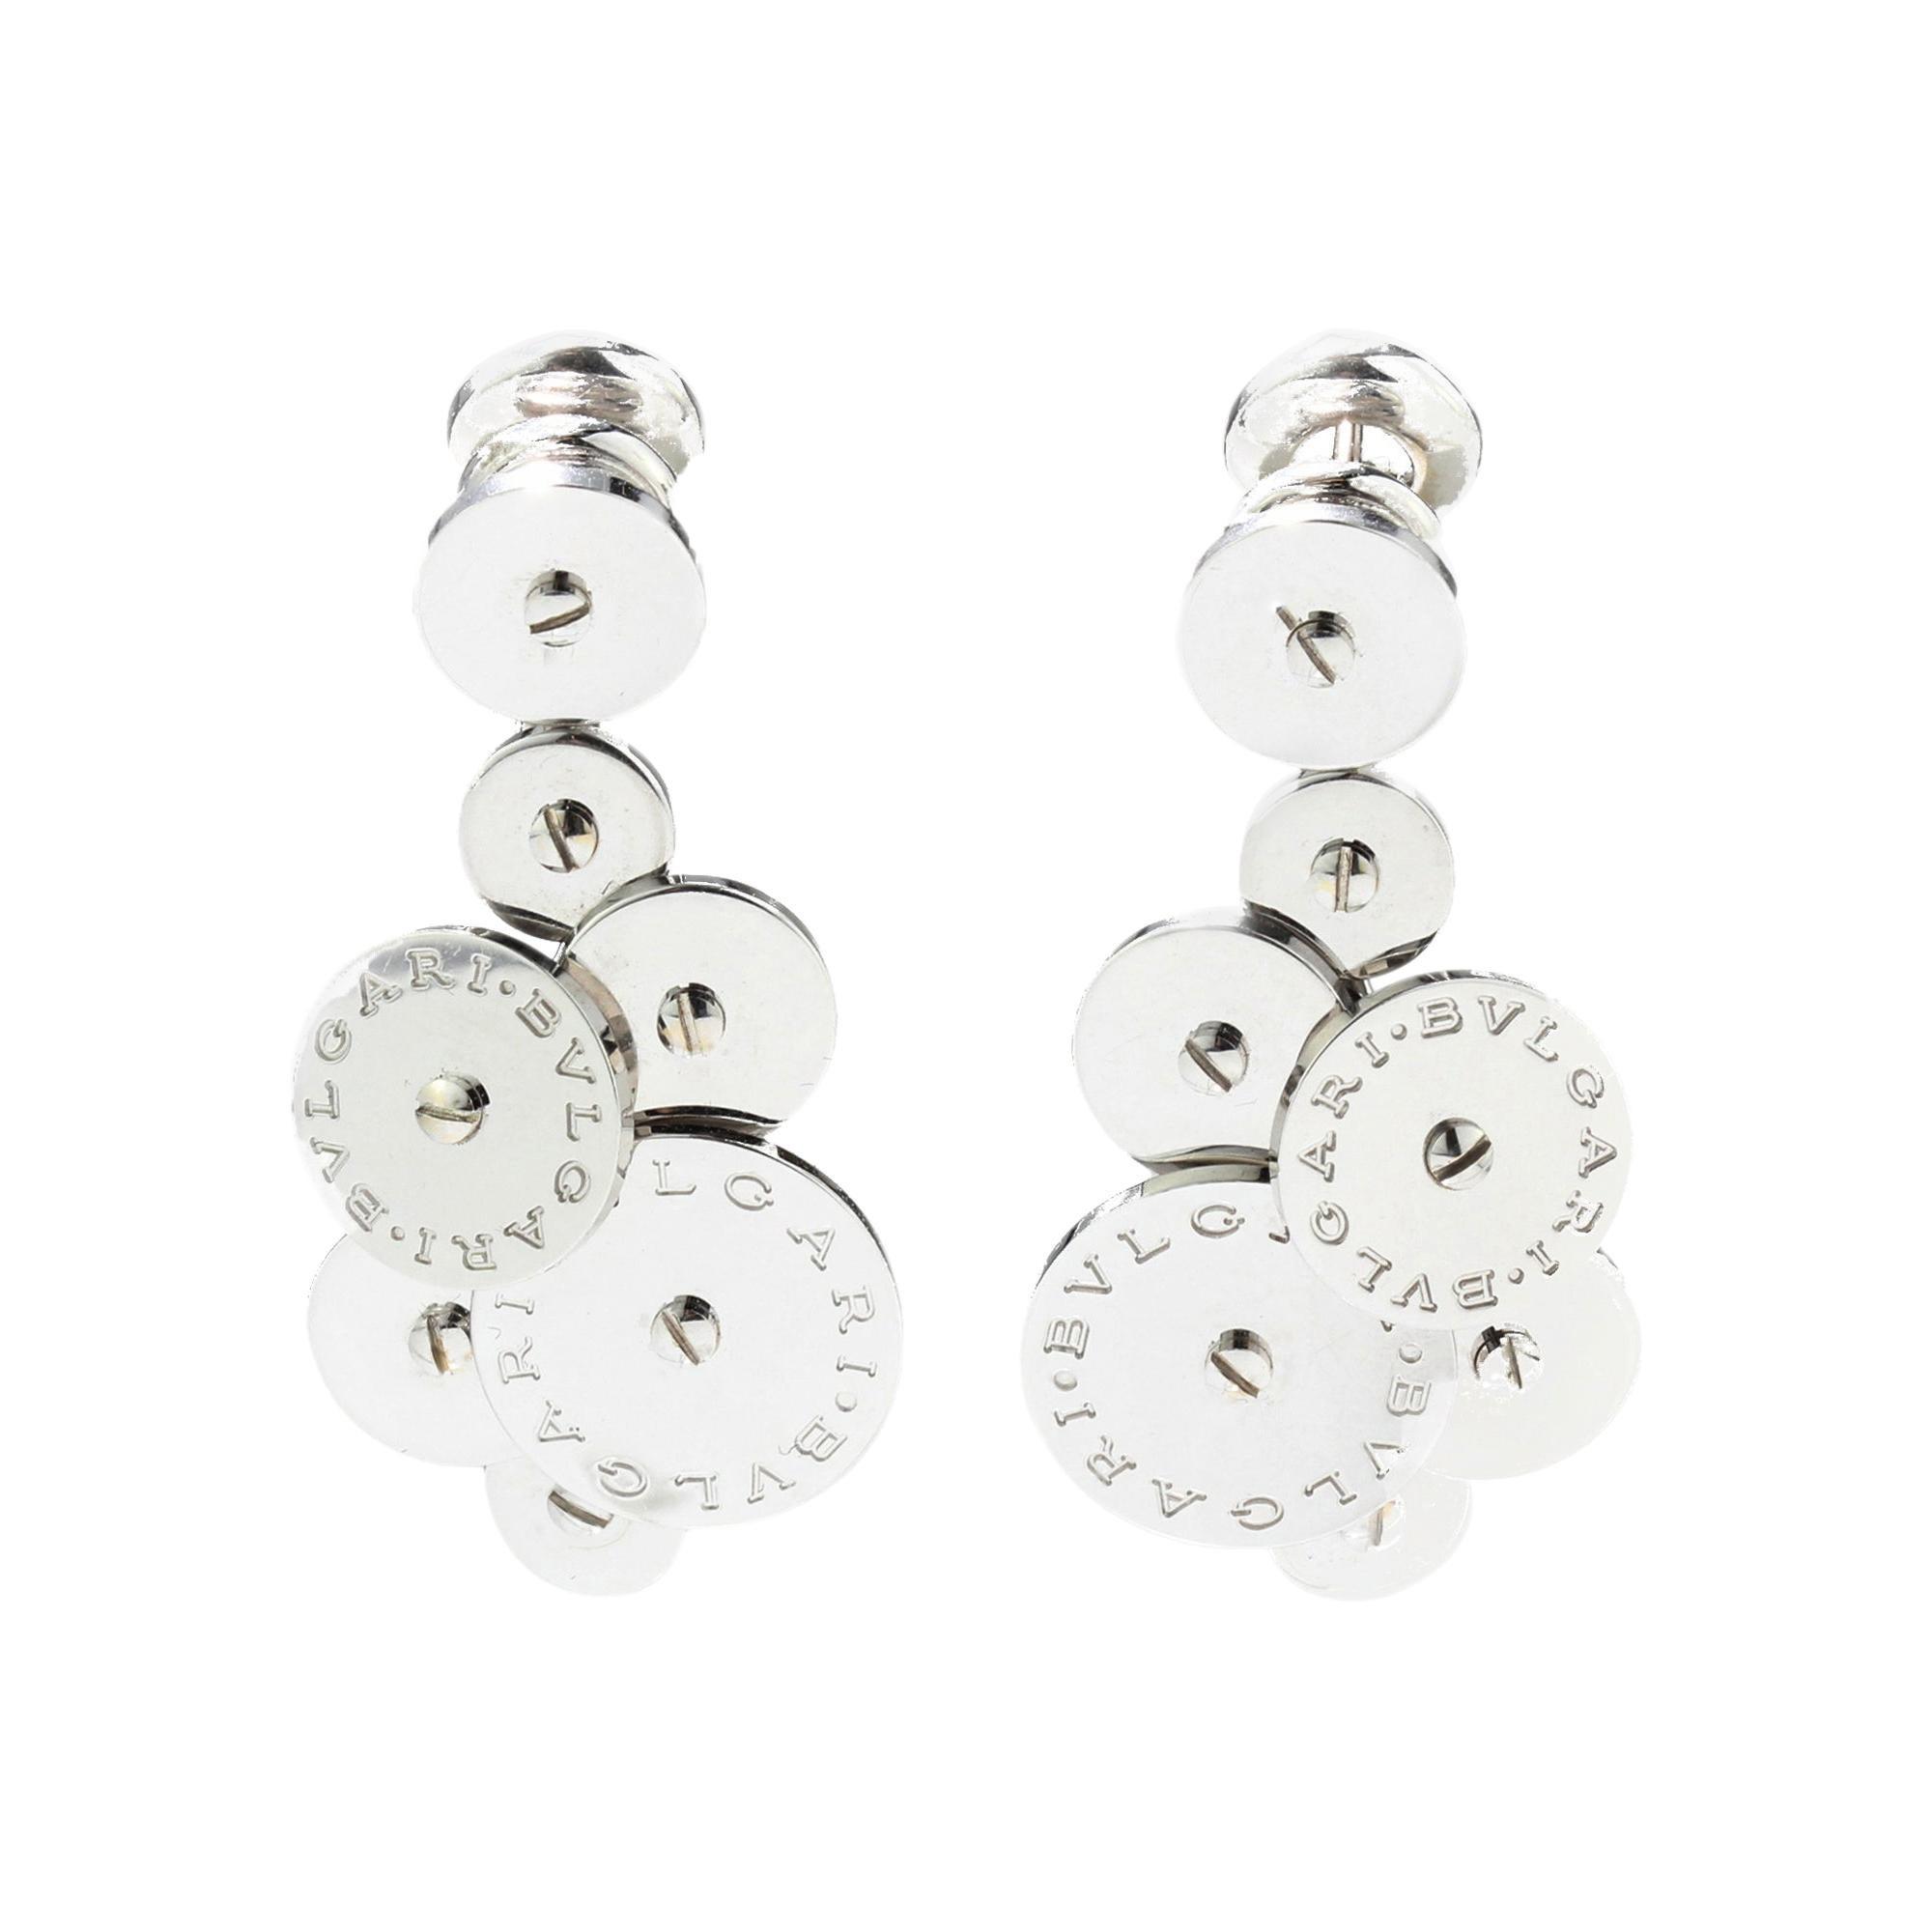 Bvlgari 18kt White Gold Ladies Clip-On Earrings